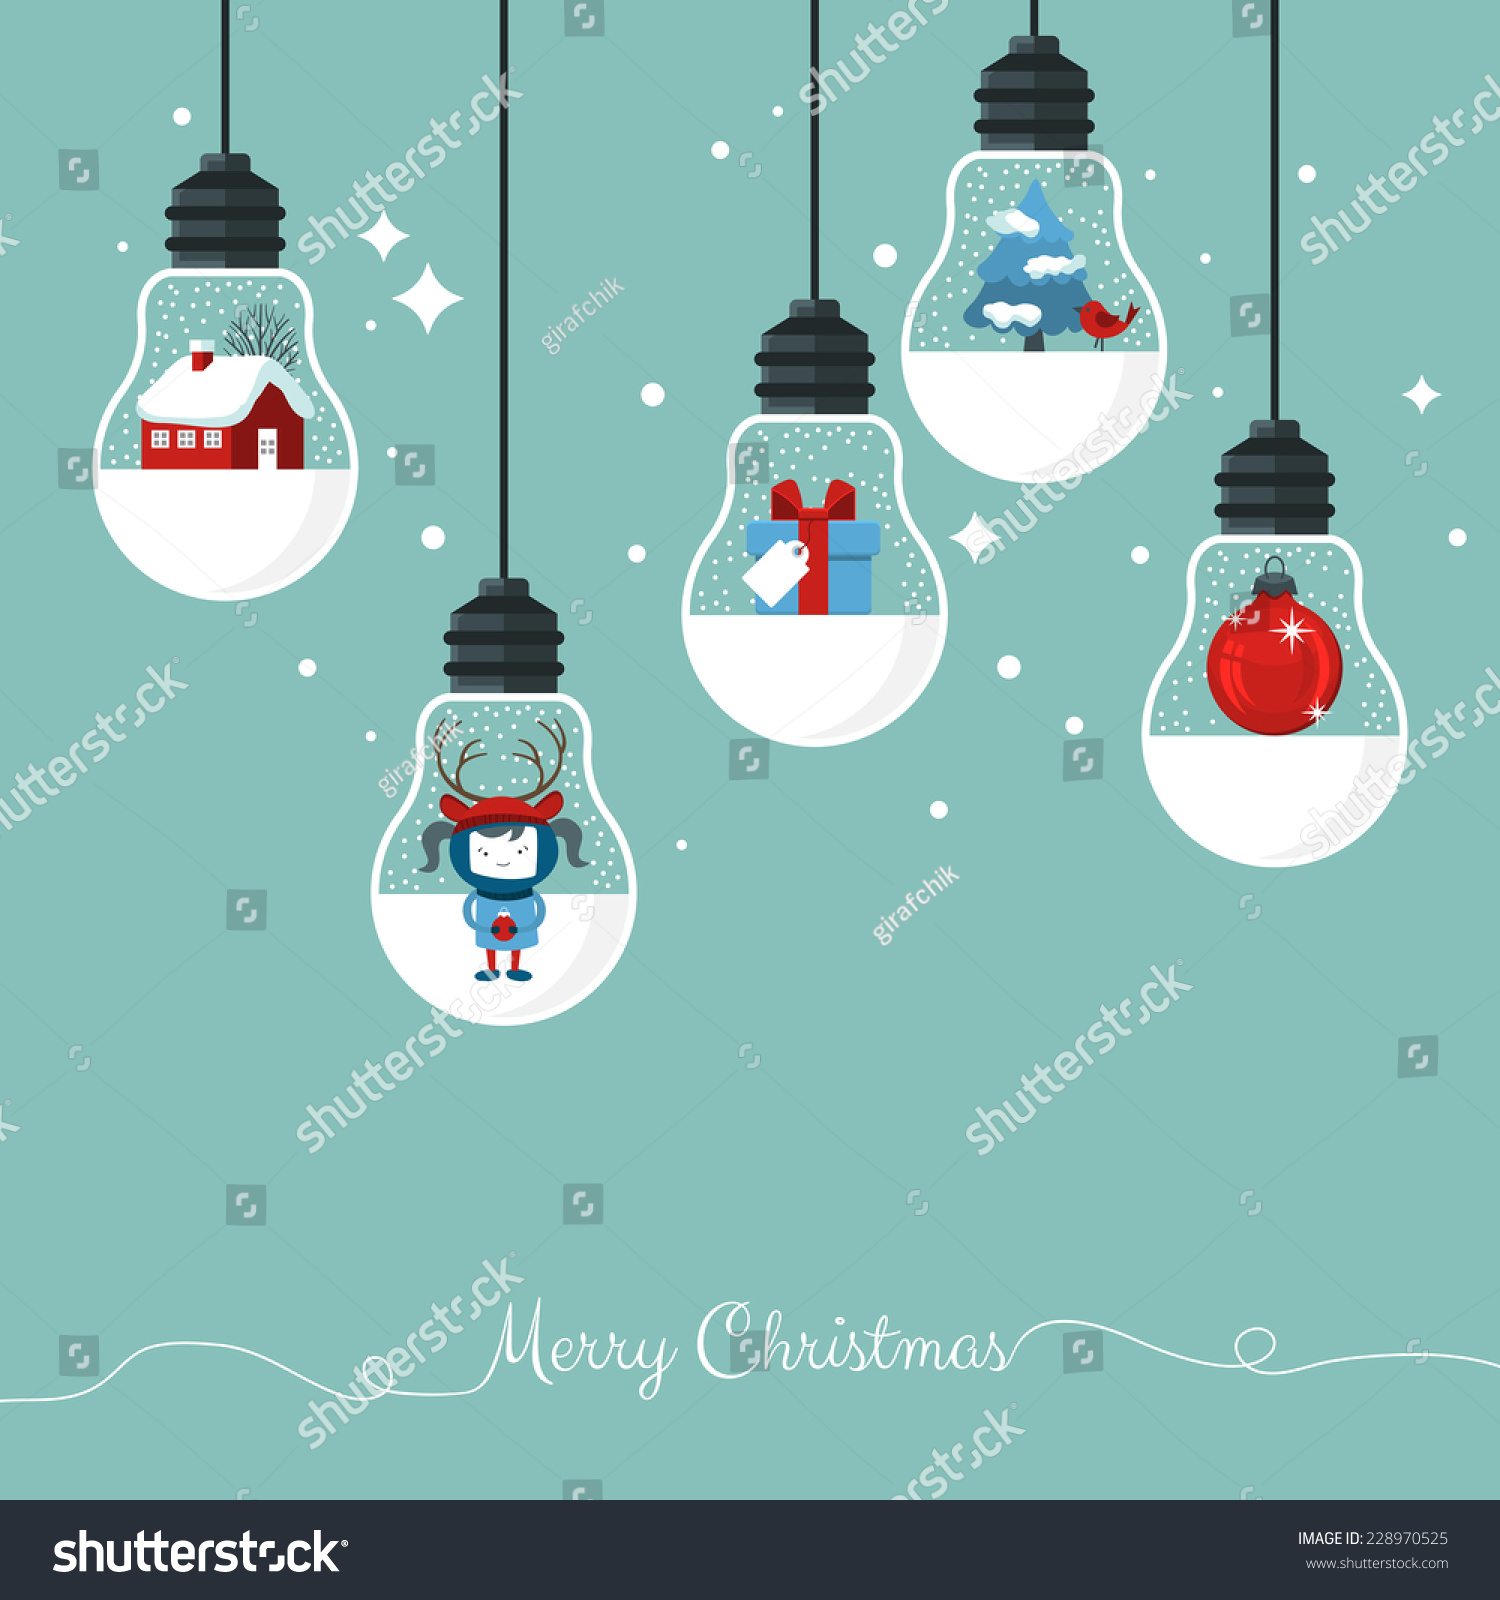 Modern Christmas Card Flat Stylish Design Stock Vector (Royalty Free ...